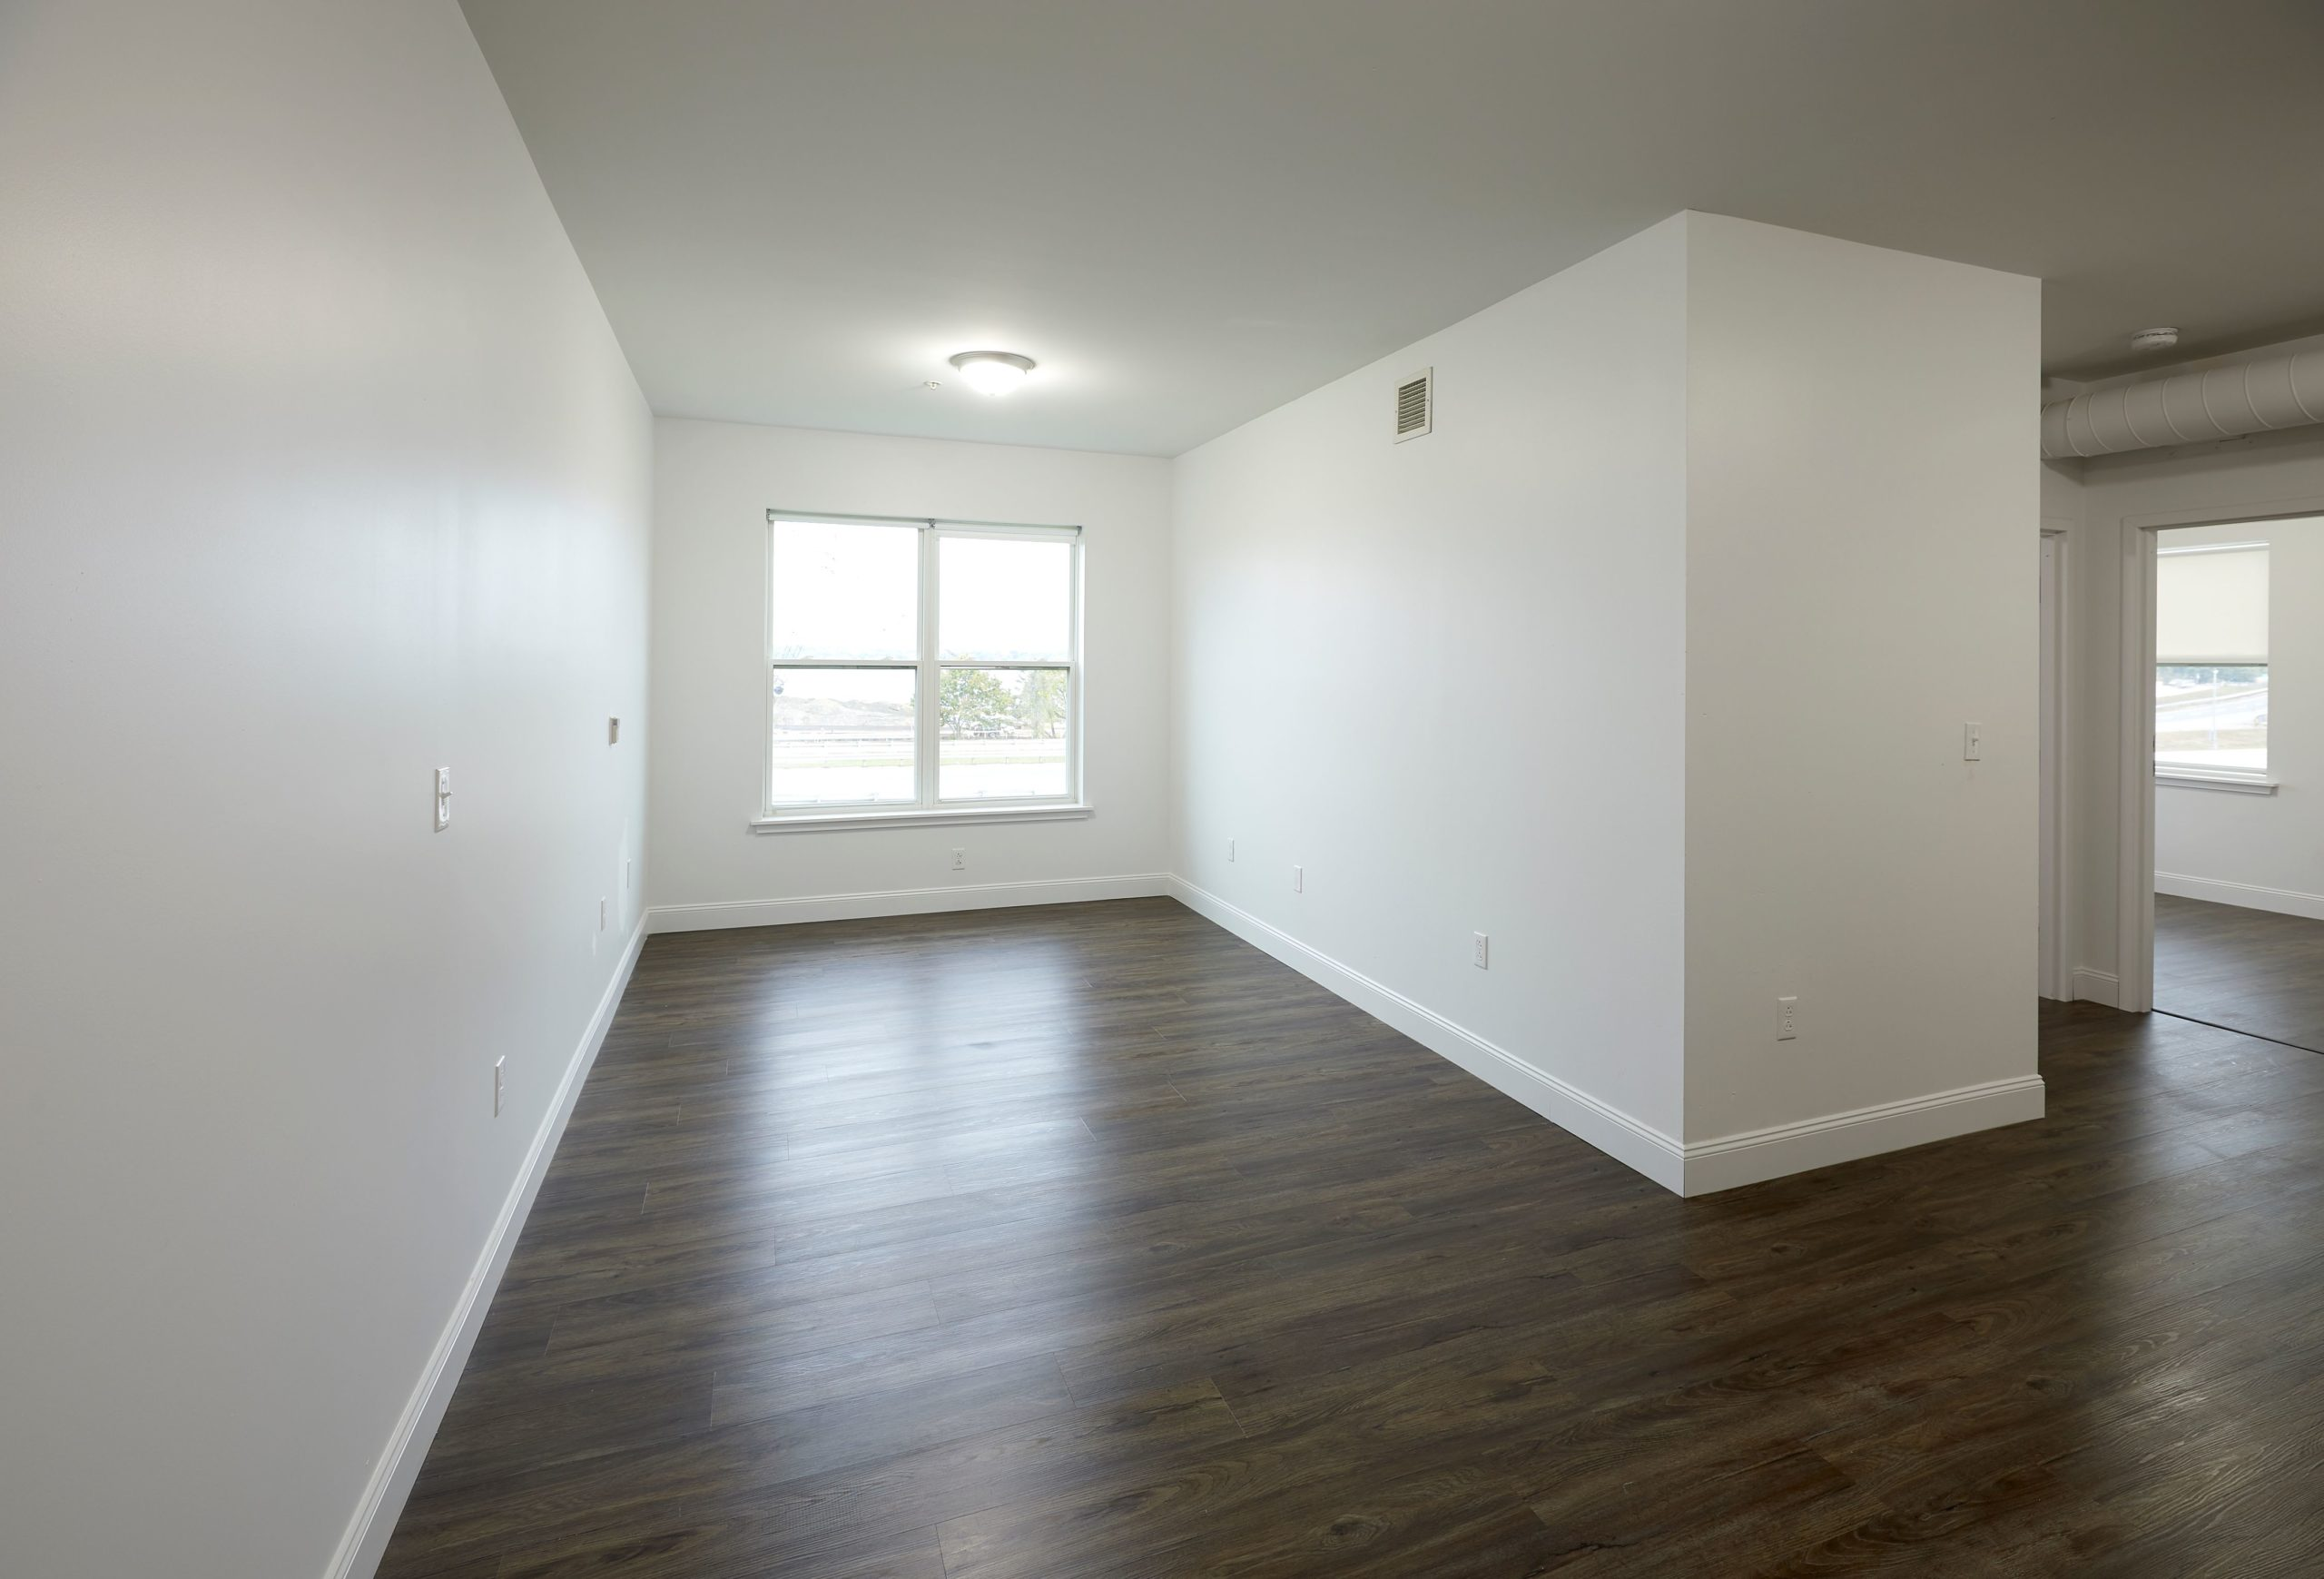 132 Marginal Way – The Linden – Apartment 331 **Corner Unit! Back Cove Views!**